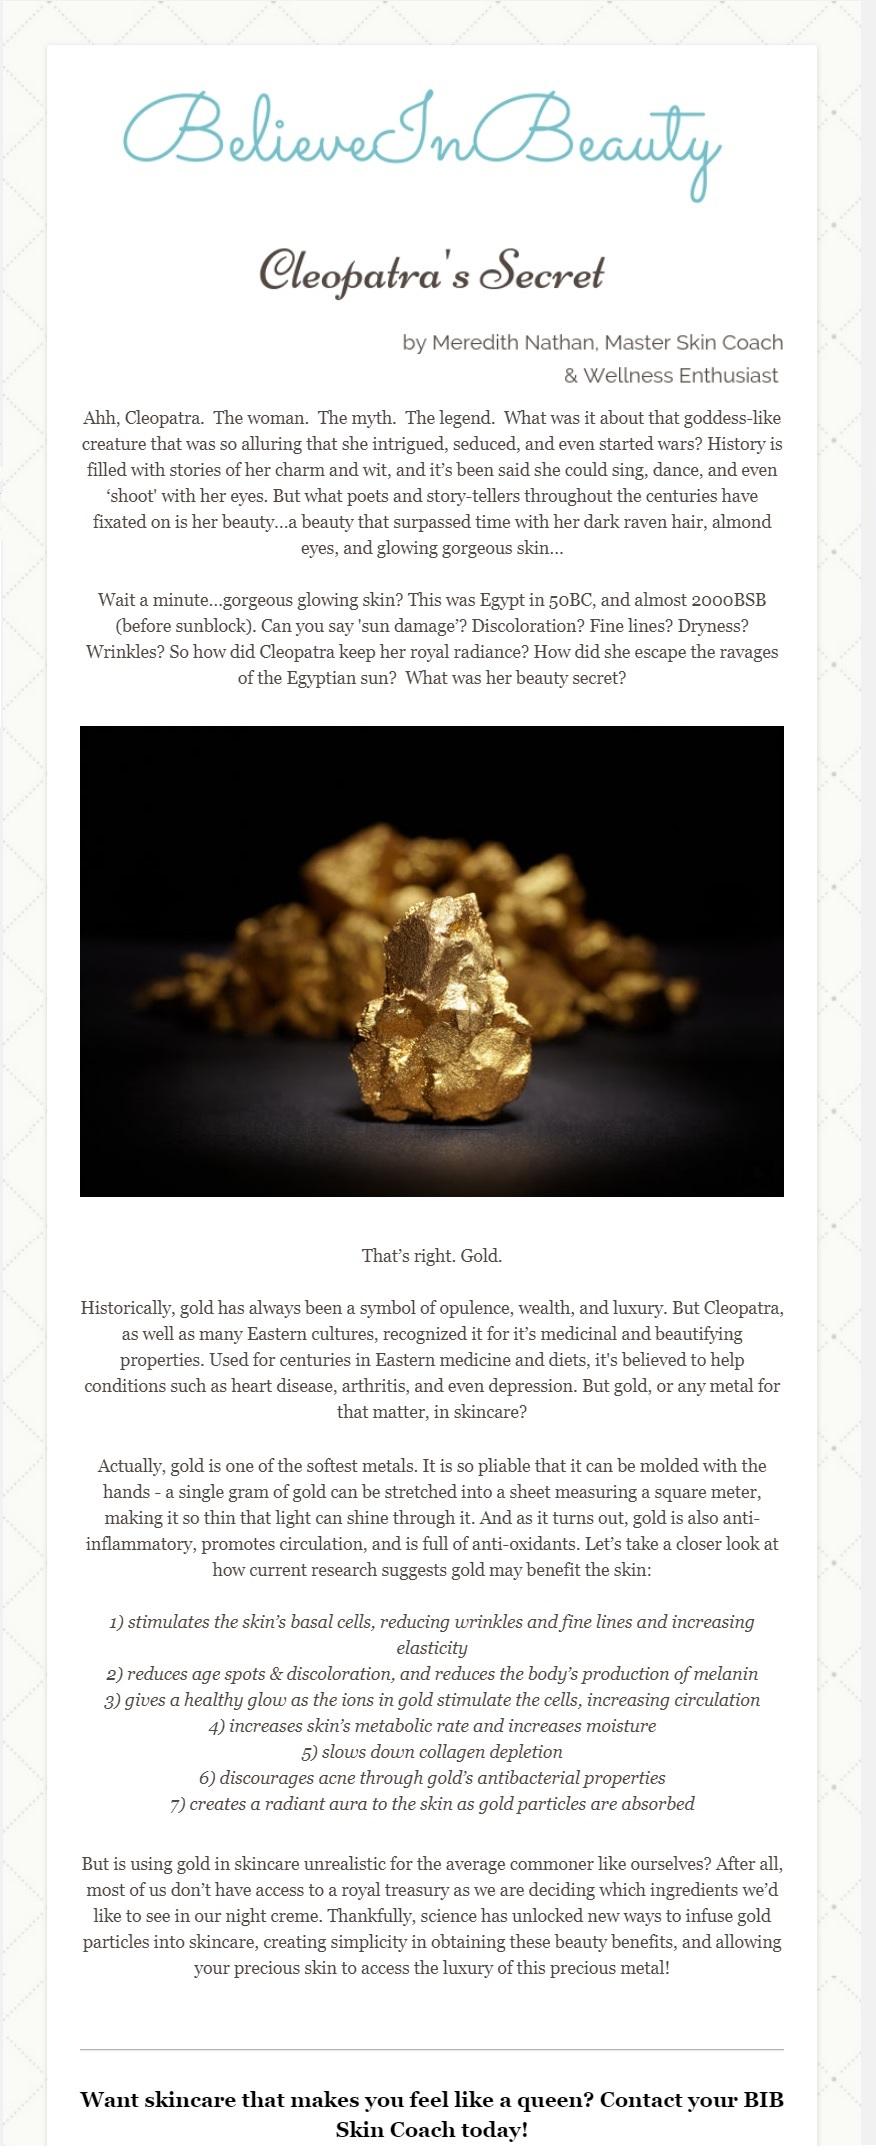 Cleopatras secret blog.jpg